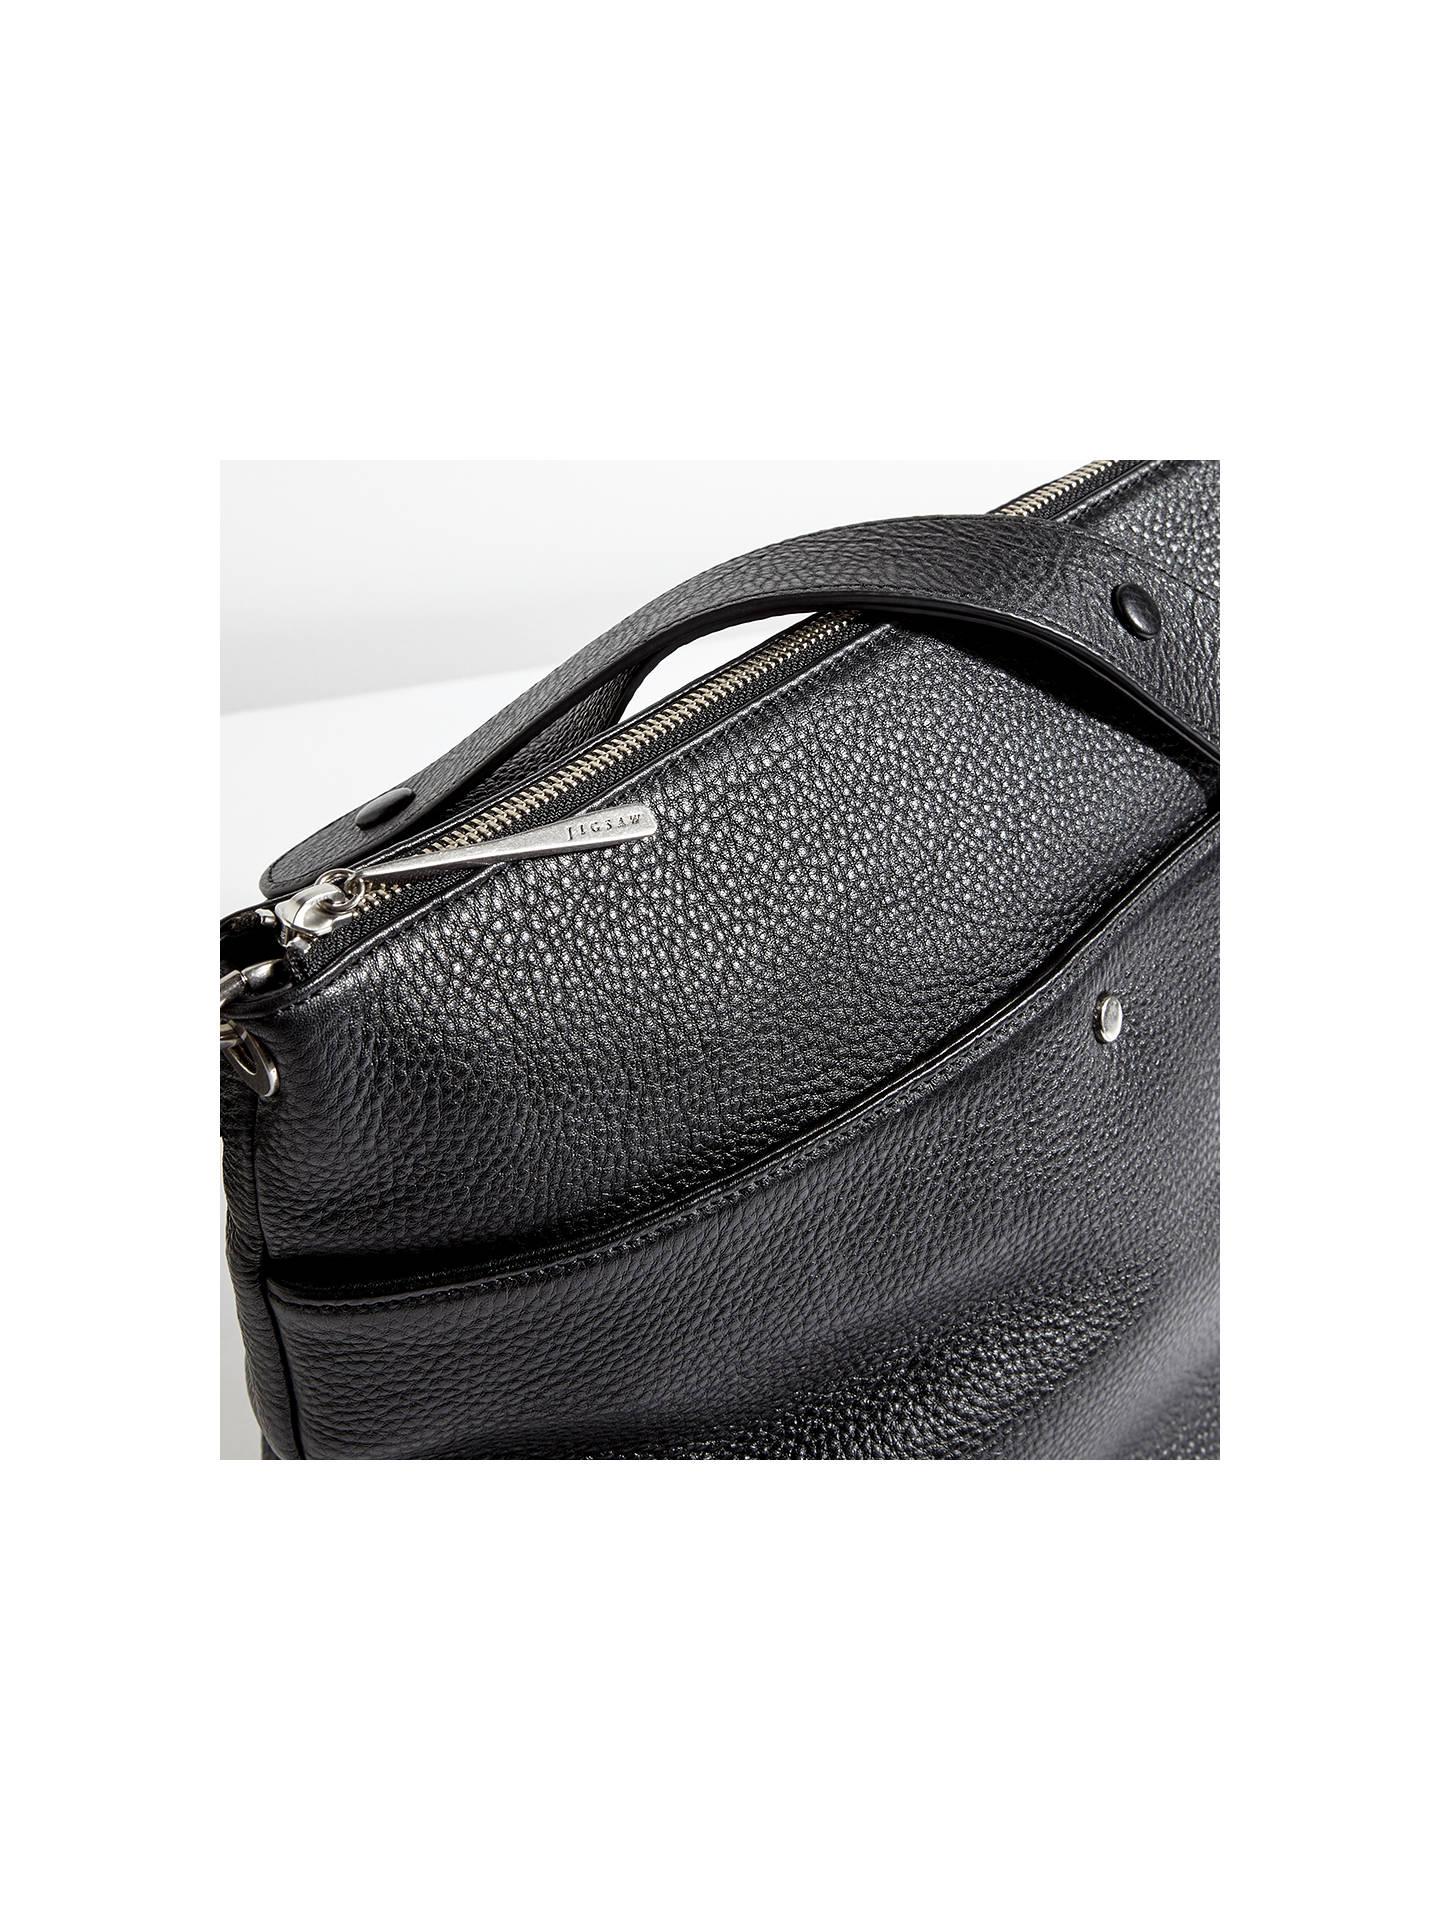 32f3294ae3 ... Buy Jigsaw Cameron Leather Hobo Bag